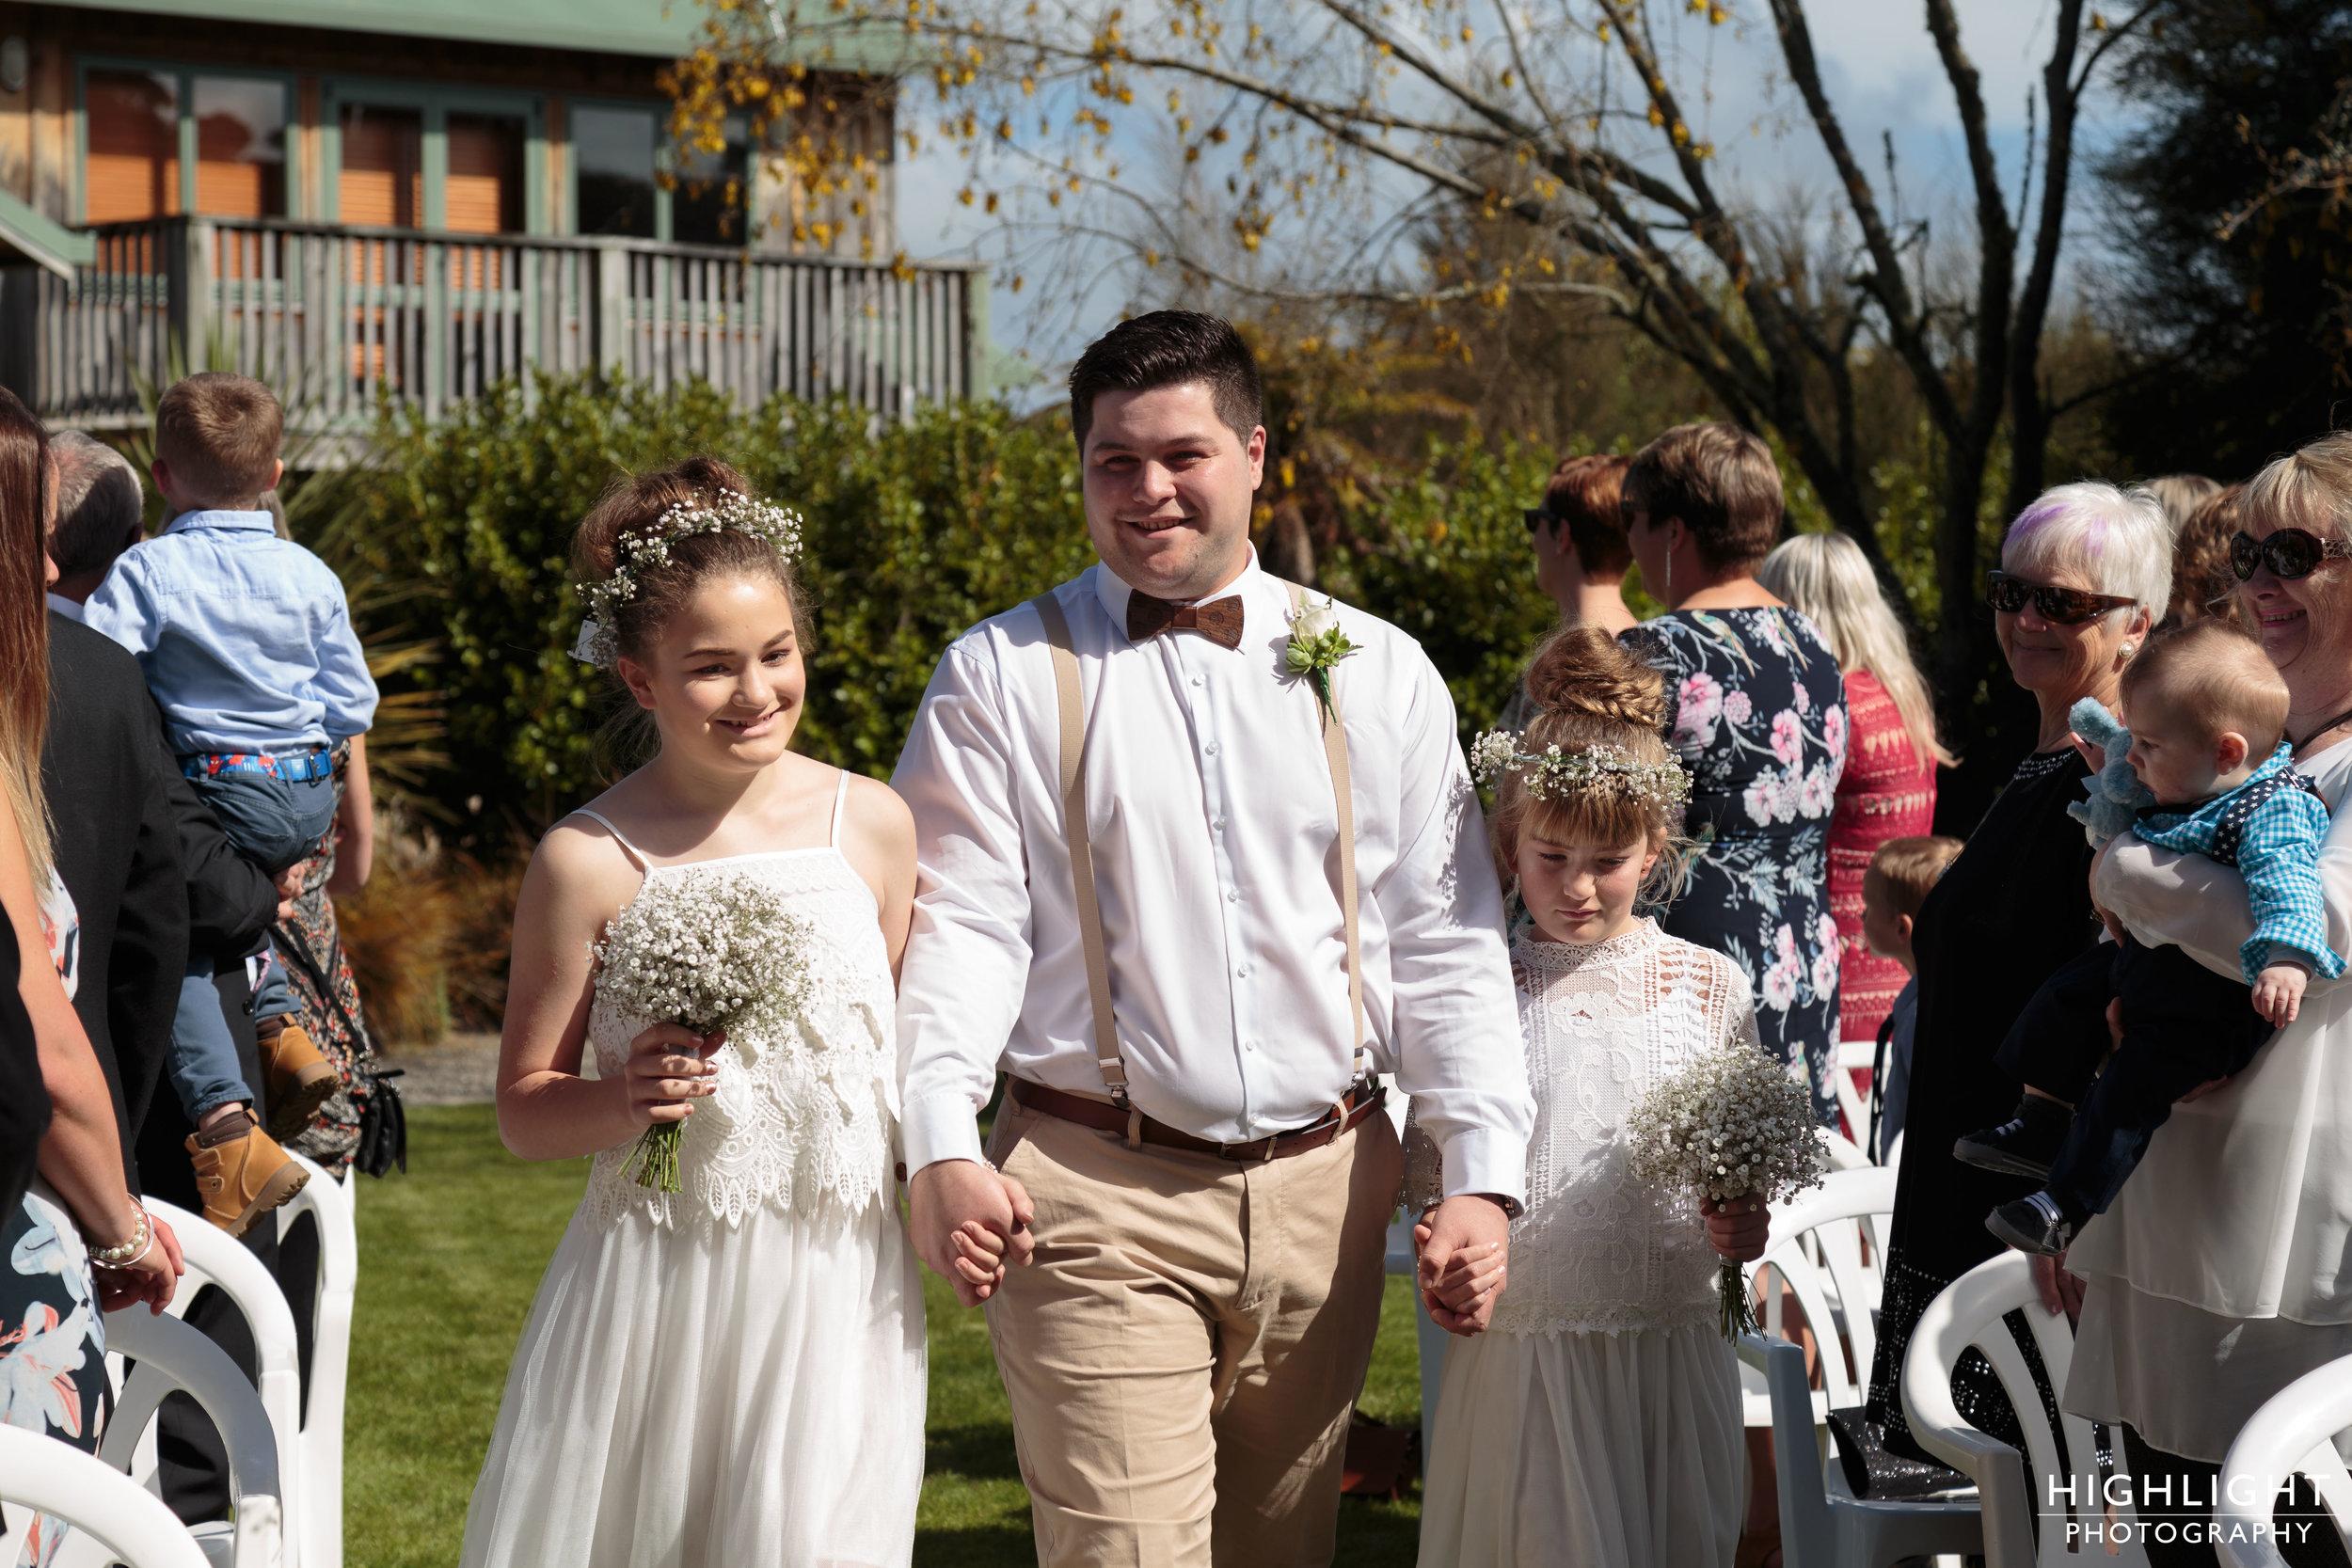 highlight_wedding_photography_makoura_lodge_manawatu_new_zealand-60.jpg